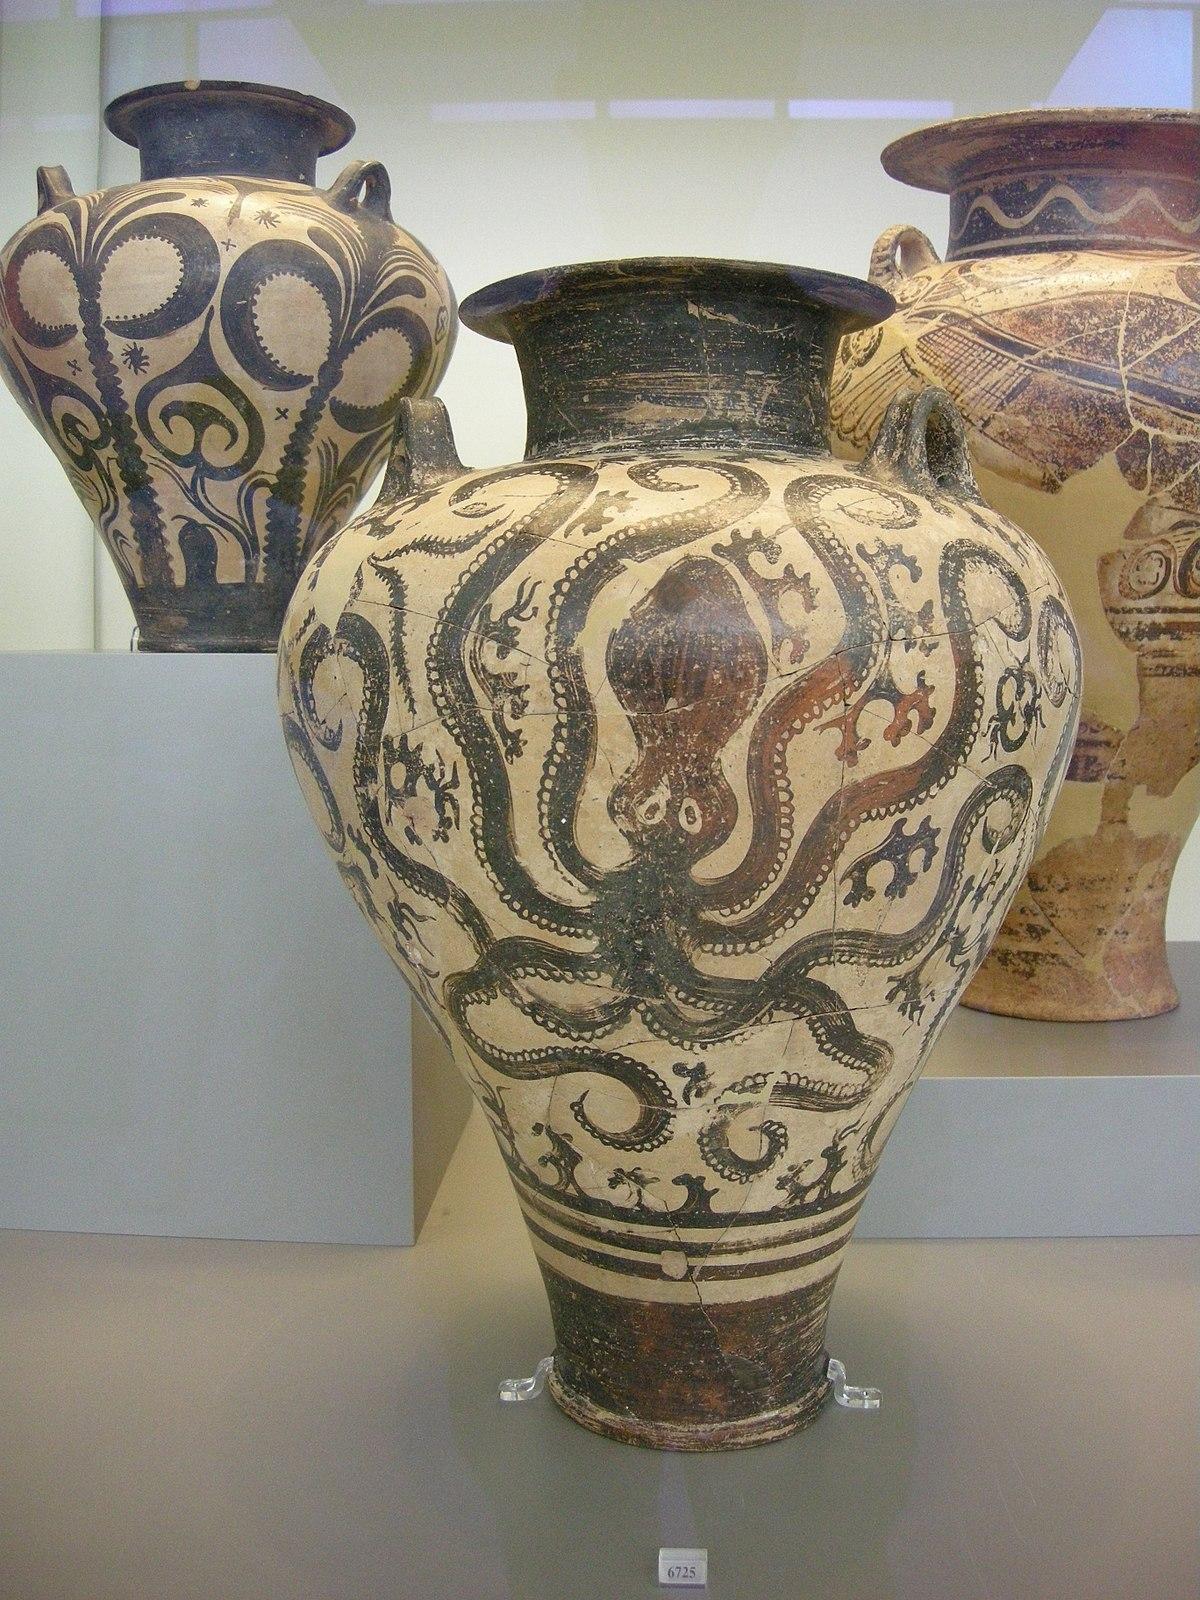 Mycenaean palace amphora with octopus (NAMA 6725) - Wikipedia